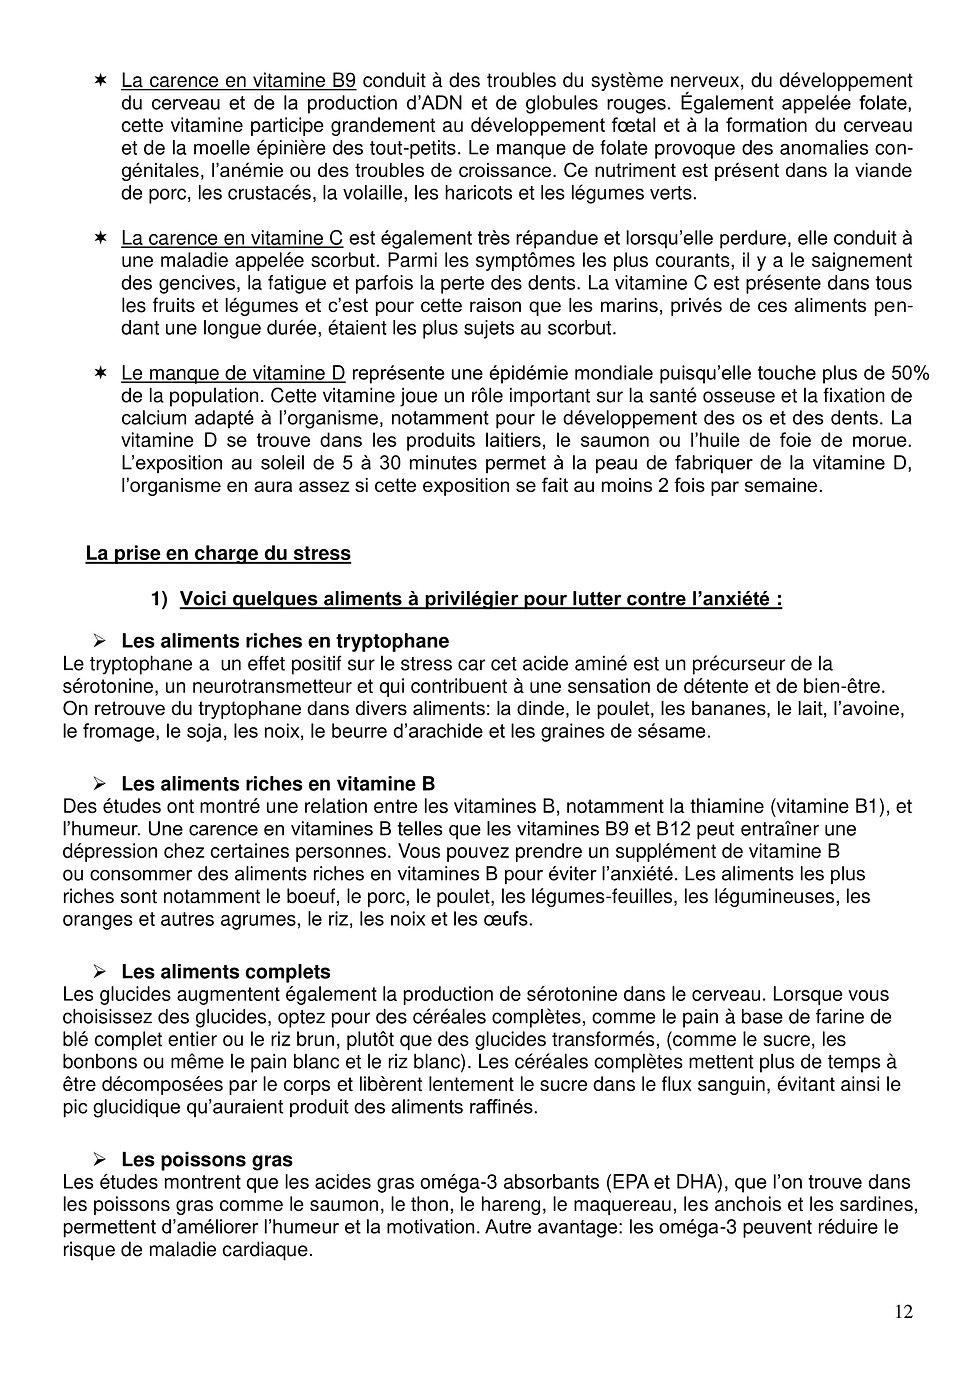 STRESS_et_ÉMOTIONS-12.jpg